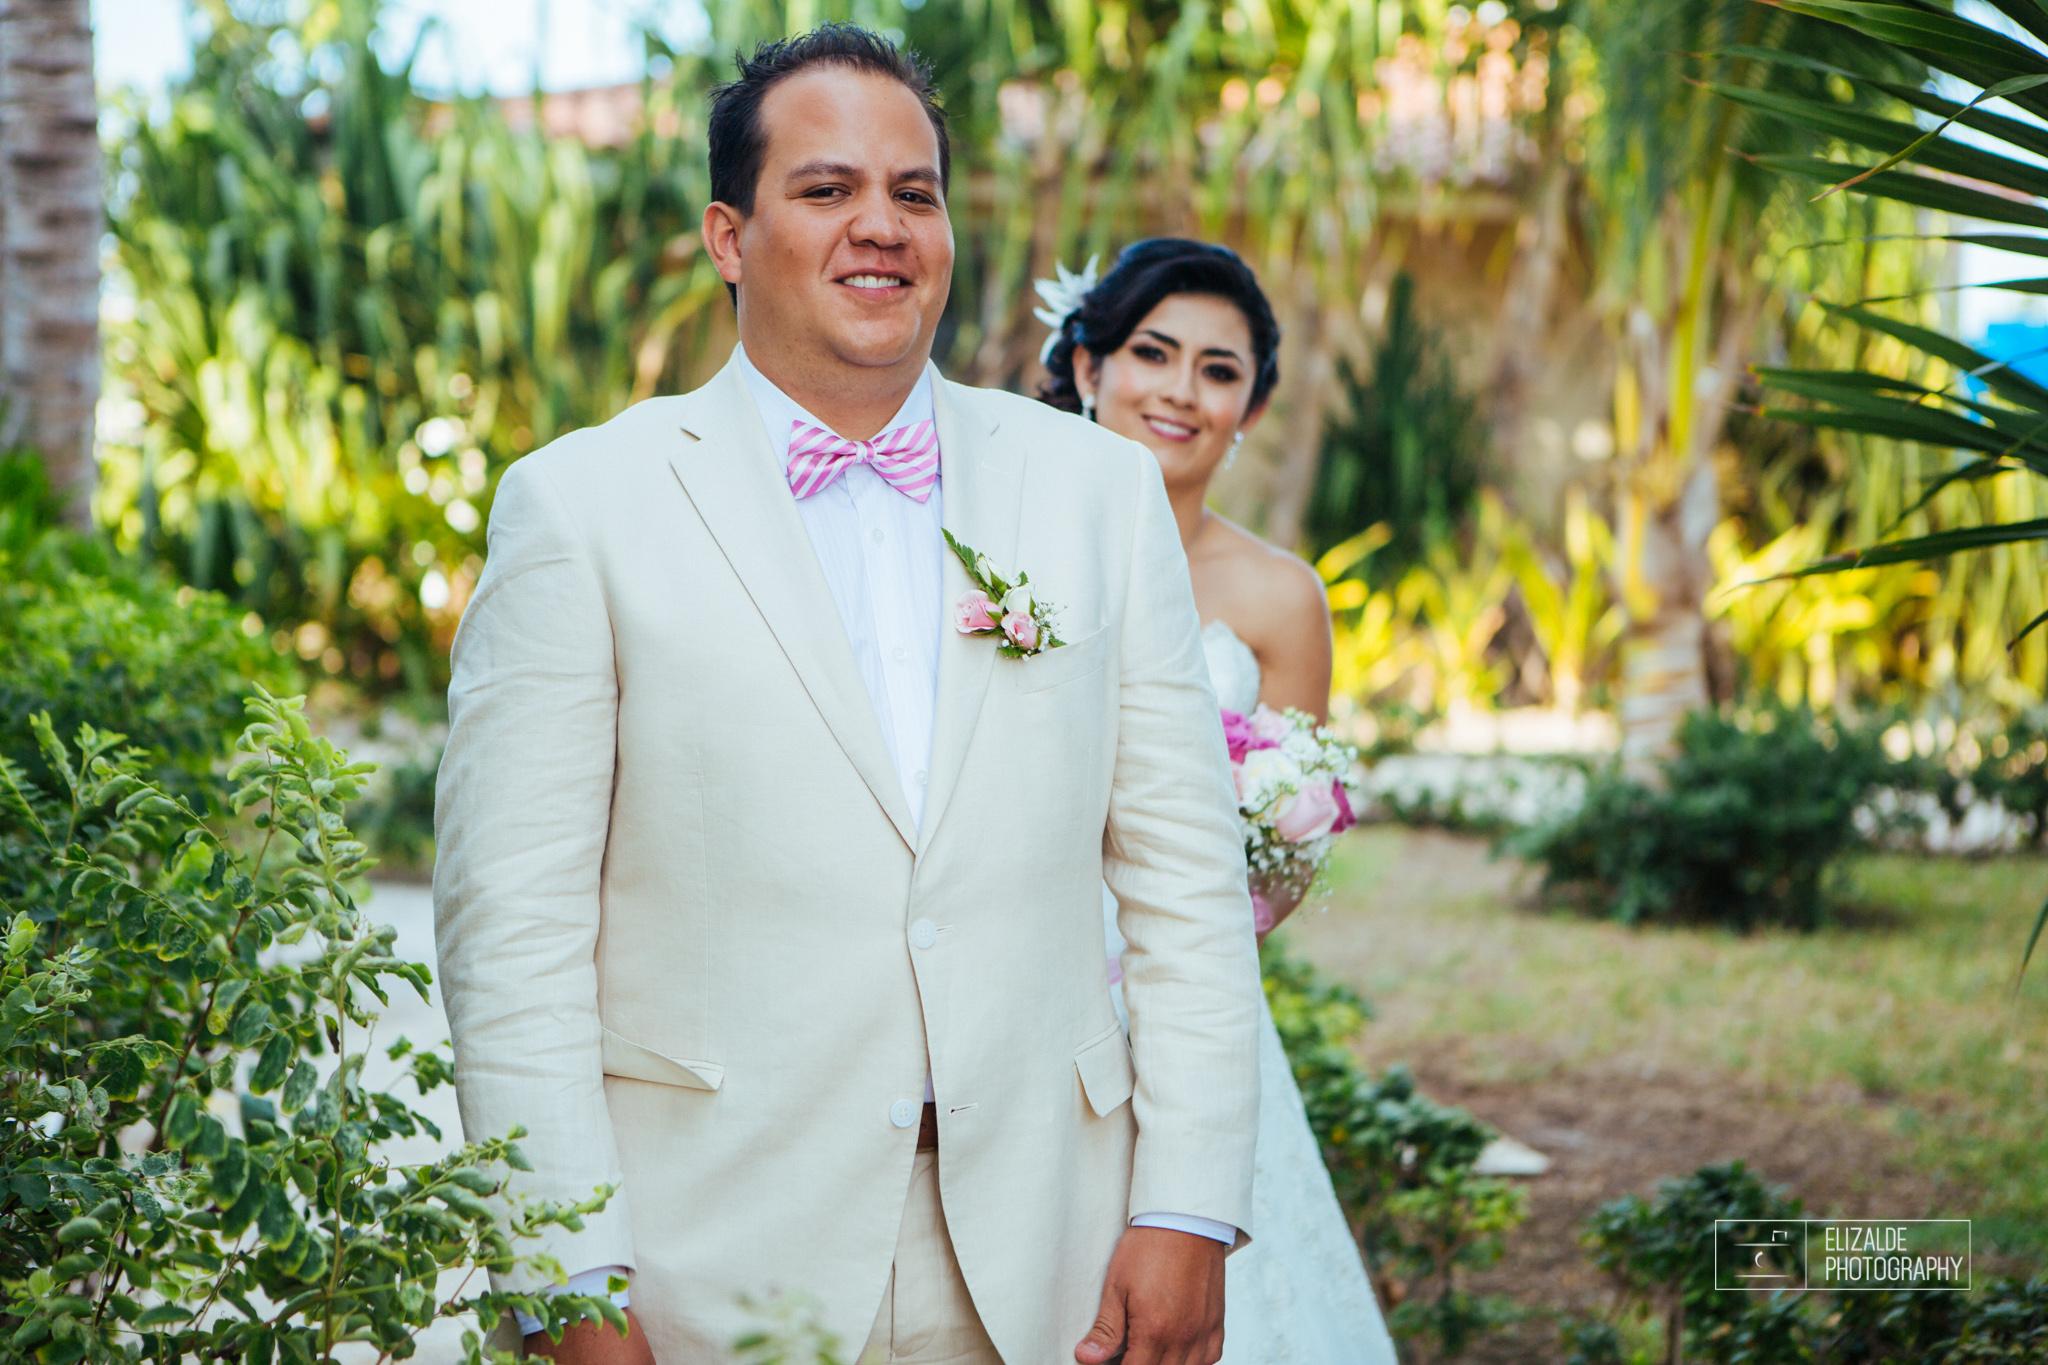 Pay and Ferran_Acapulco_Destination Wedding_Elizalde Photography-56.jpg